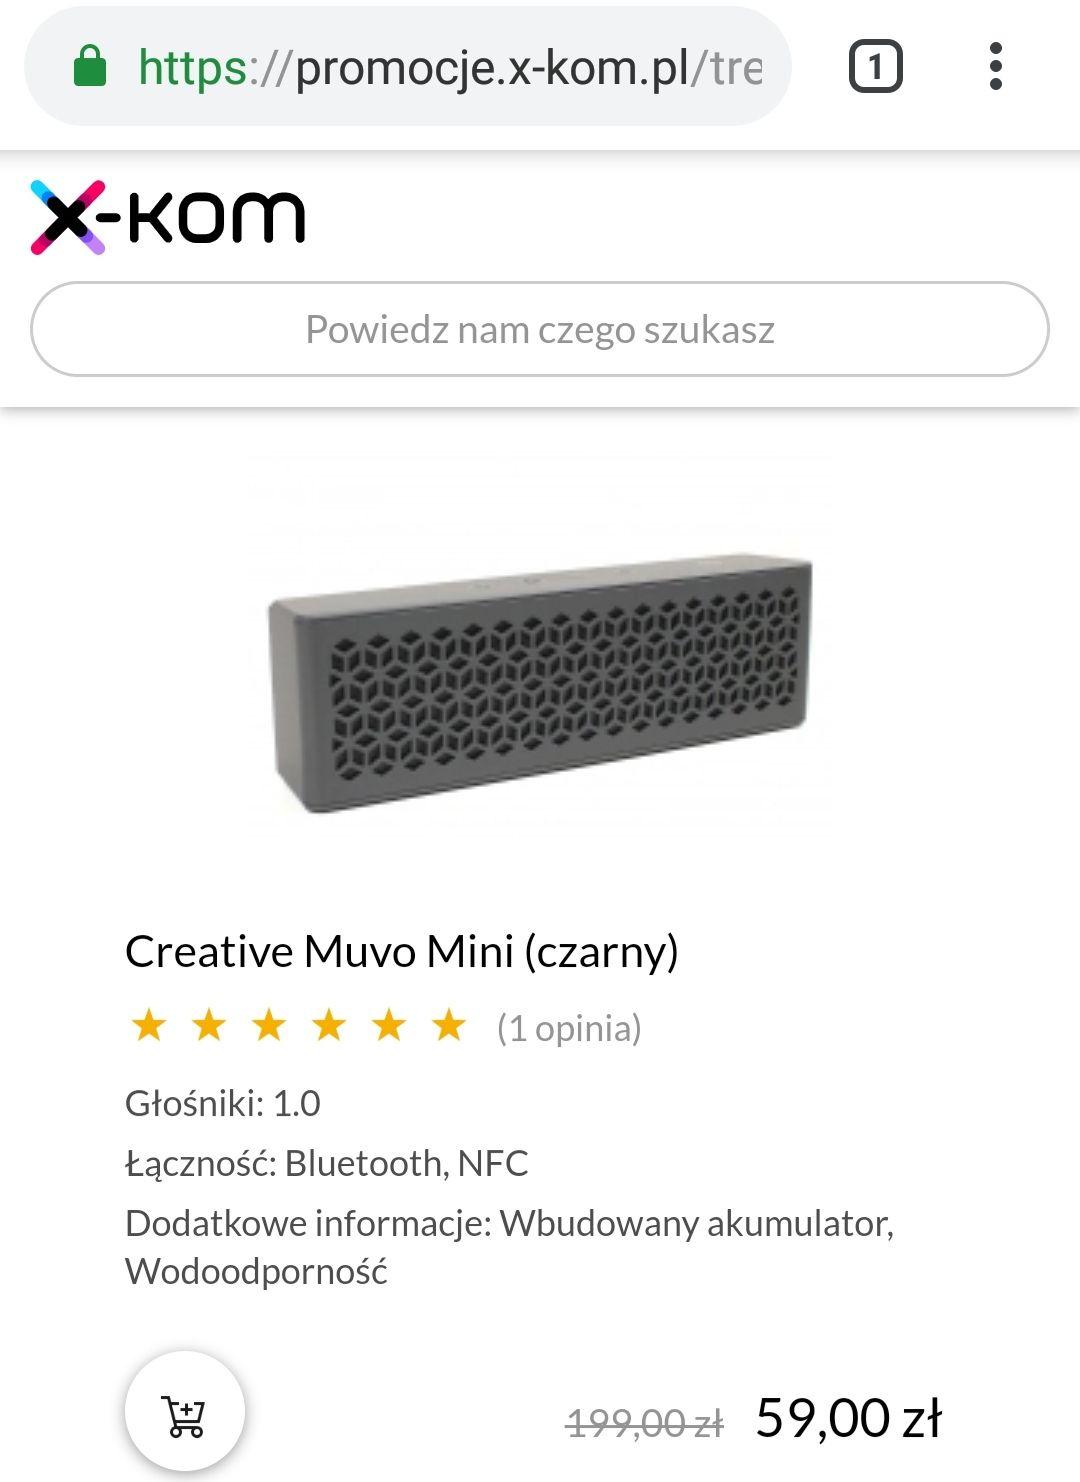 Głośnik bluetooth Creative Muvo Mini (czarny)